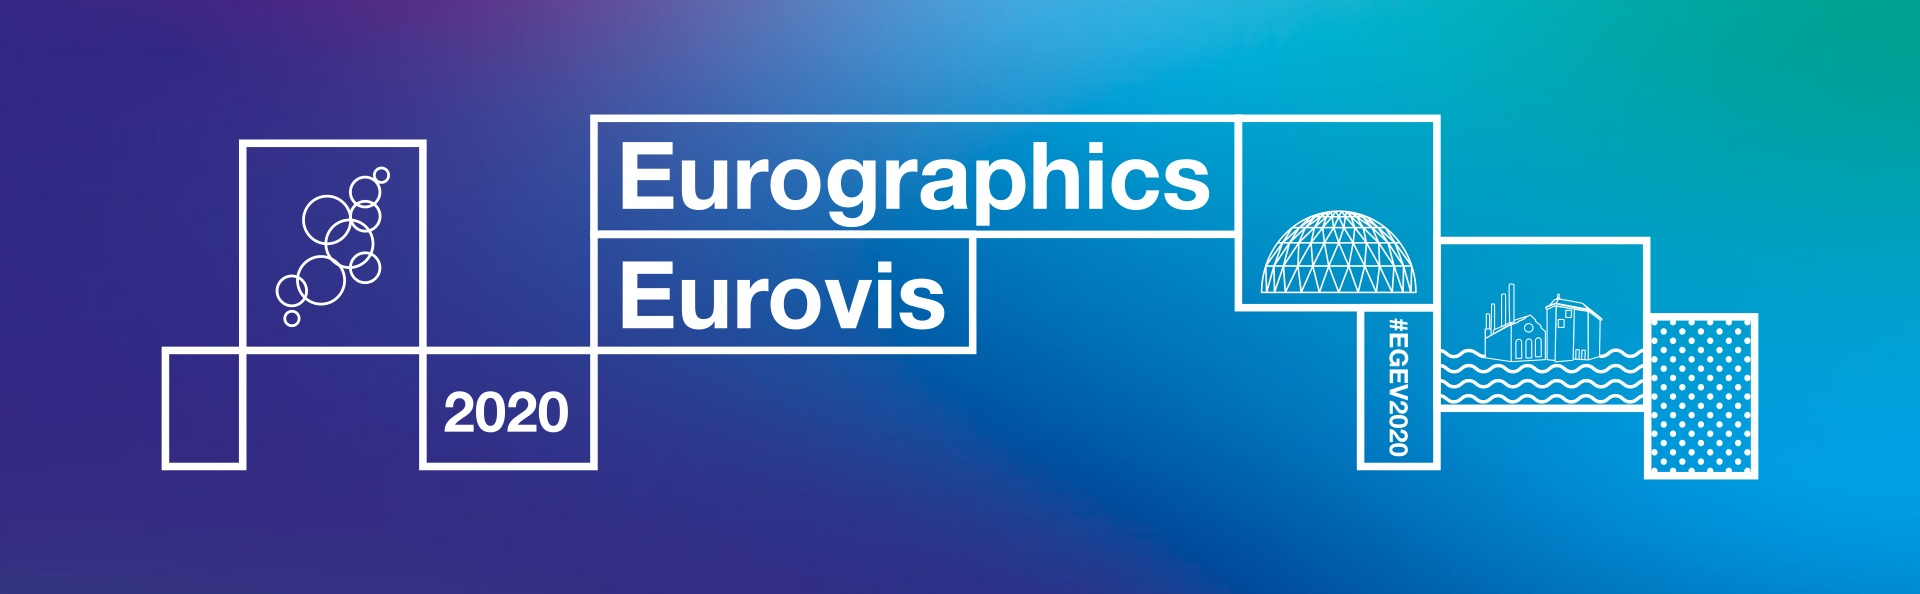 EGEV 2020 (Eurographics & Eurovis 2020)